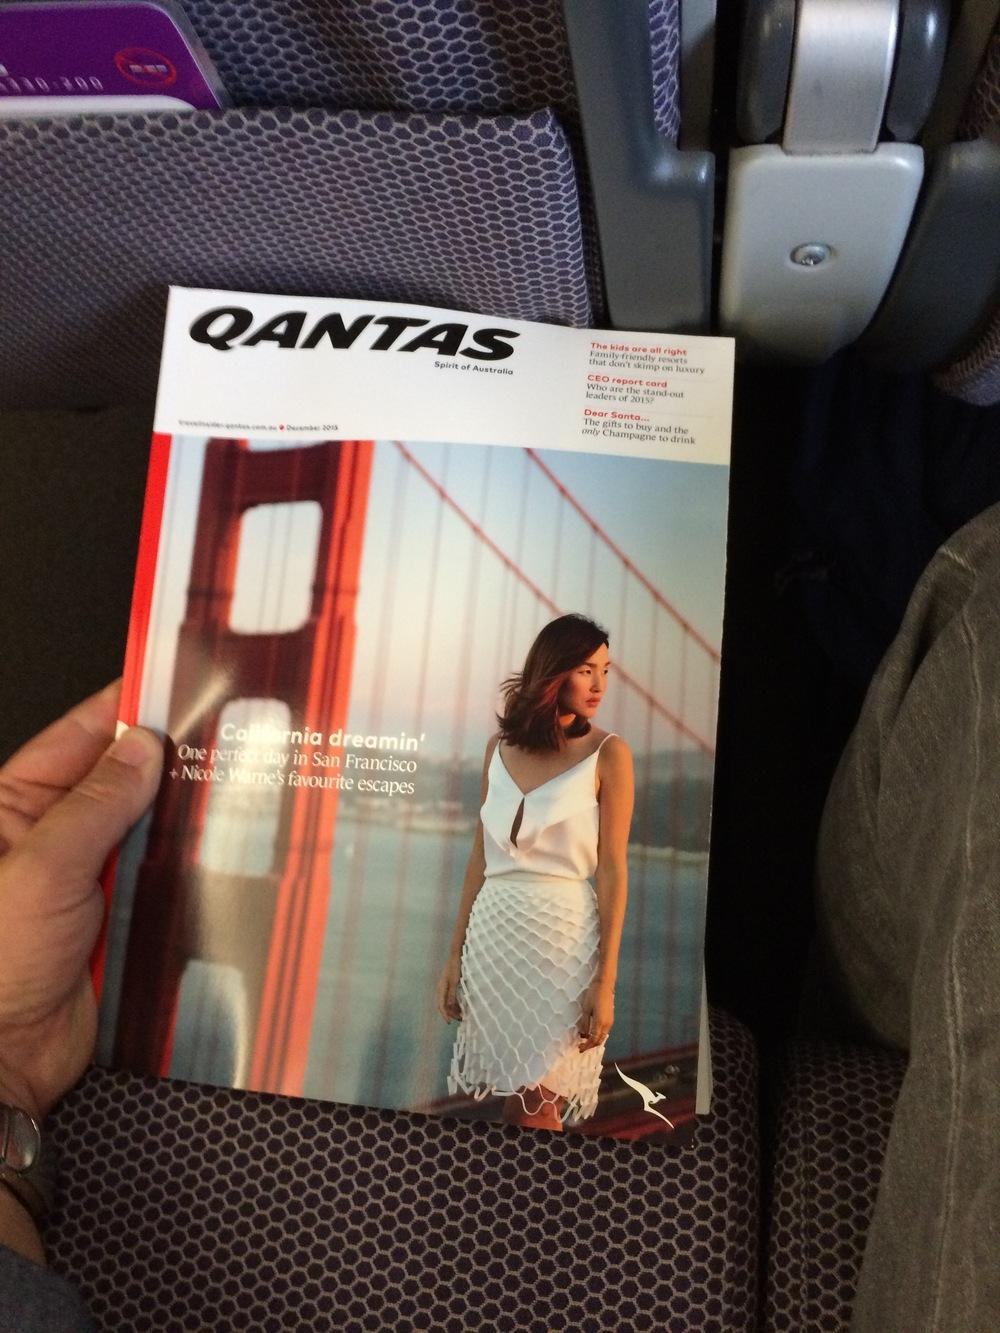 The Qantas Inflight Magazine 'Qantas'